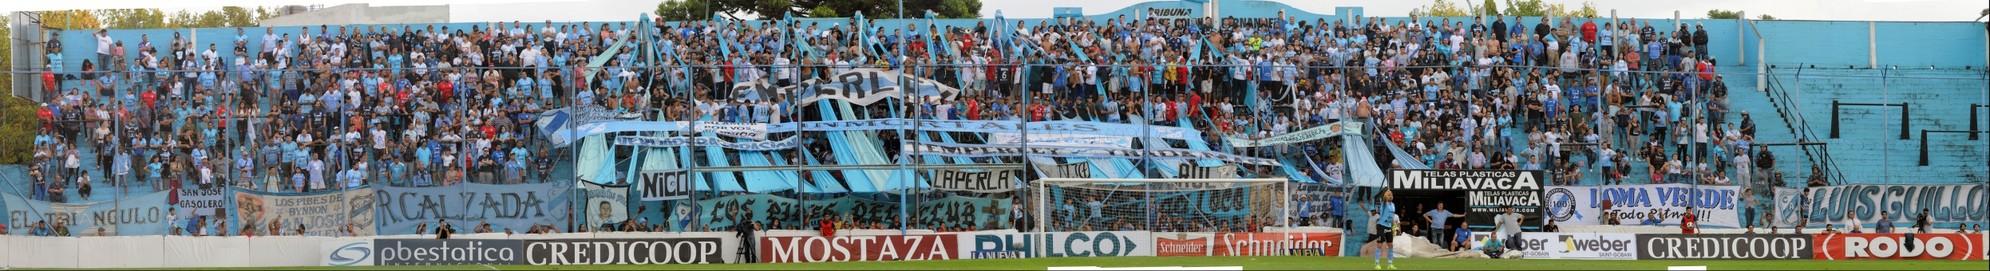 Temperley 2 - Vélez Sársfield 4   21/04/2018   SFA Fecha N°24